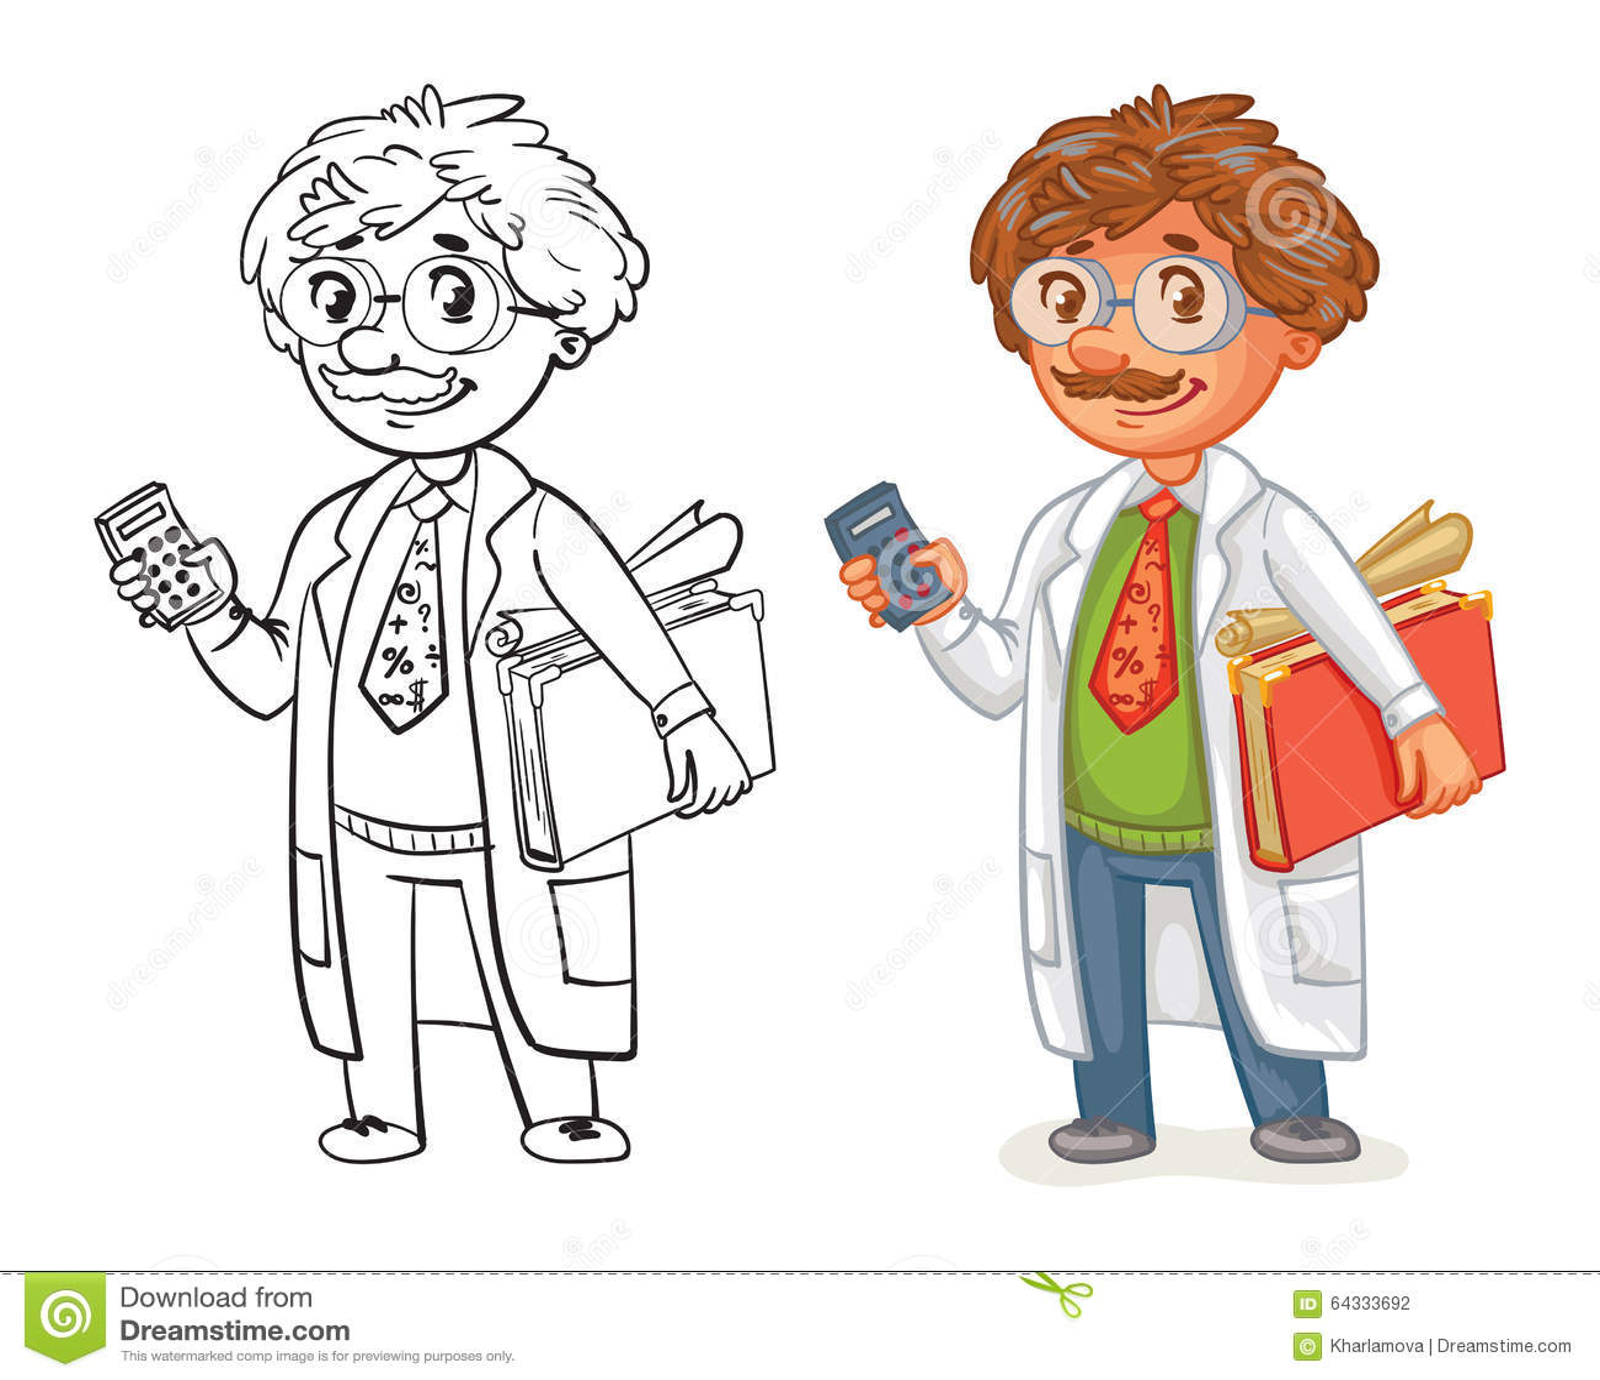 Old professor in lab coat stock vector. Illustration of color - 64333692